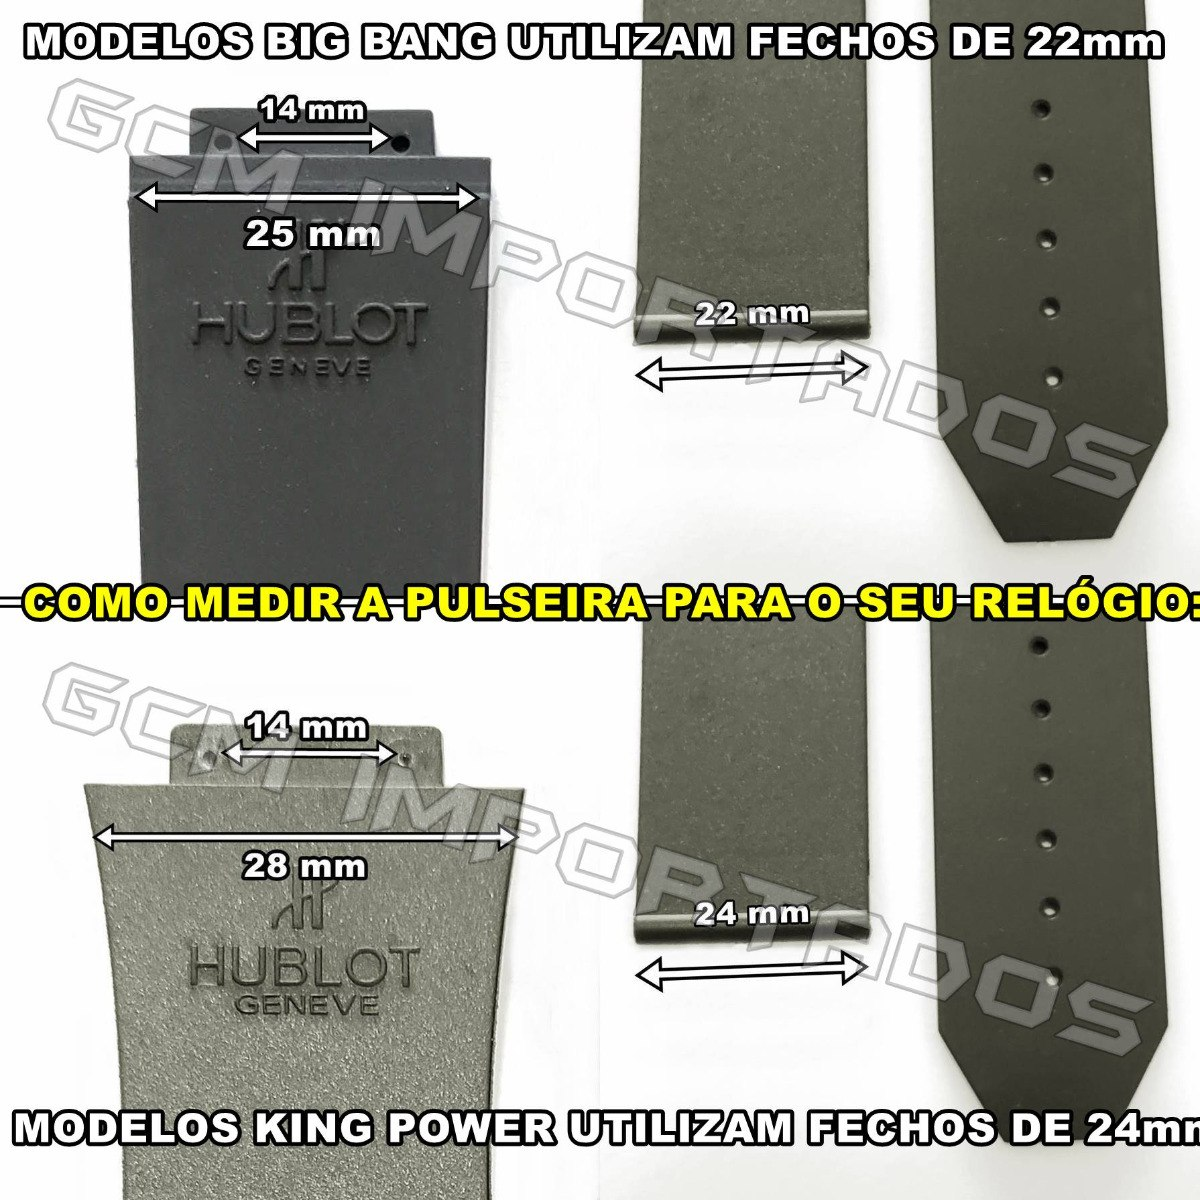 599c38c6256 Pulseira Hublot King Power F1 Ayrton Senna Costura Verde - R  69